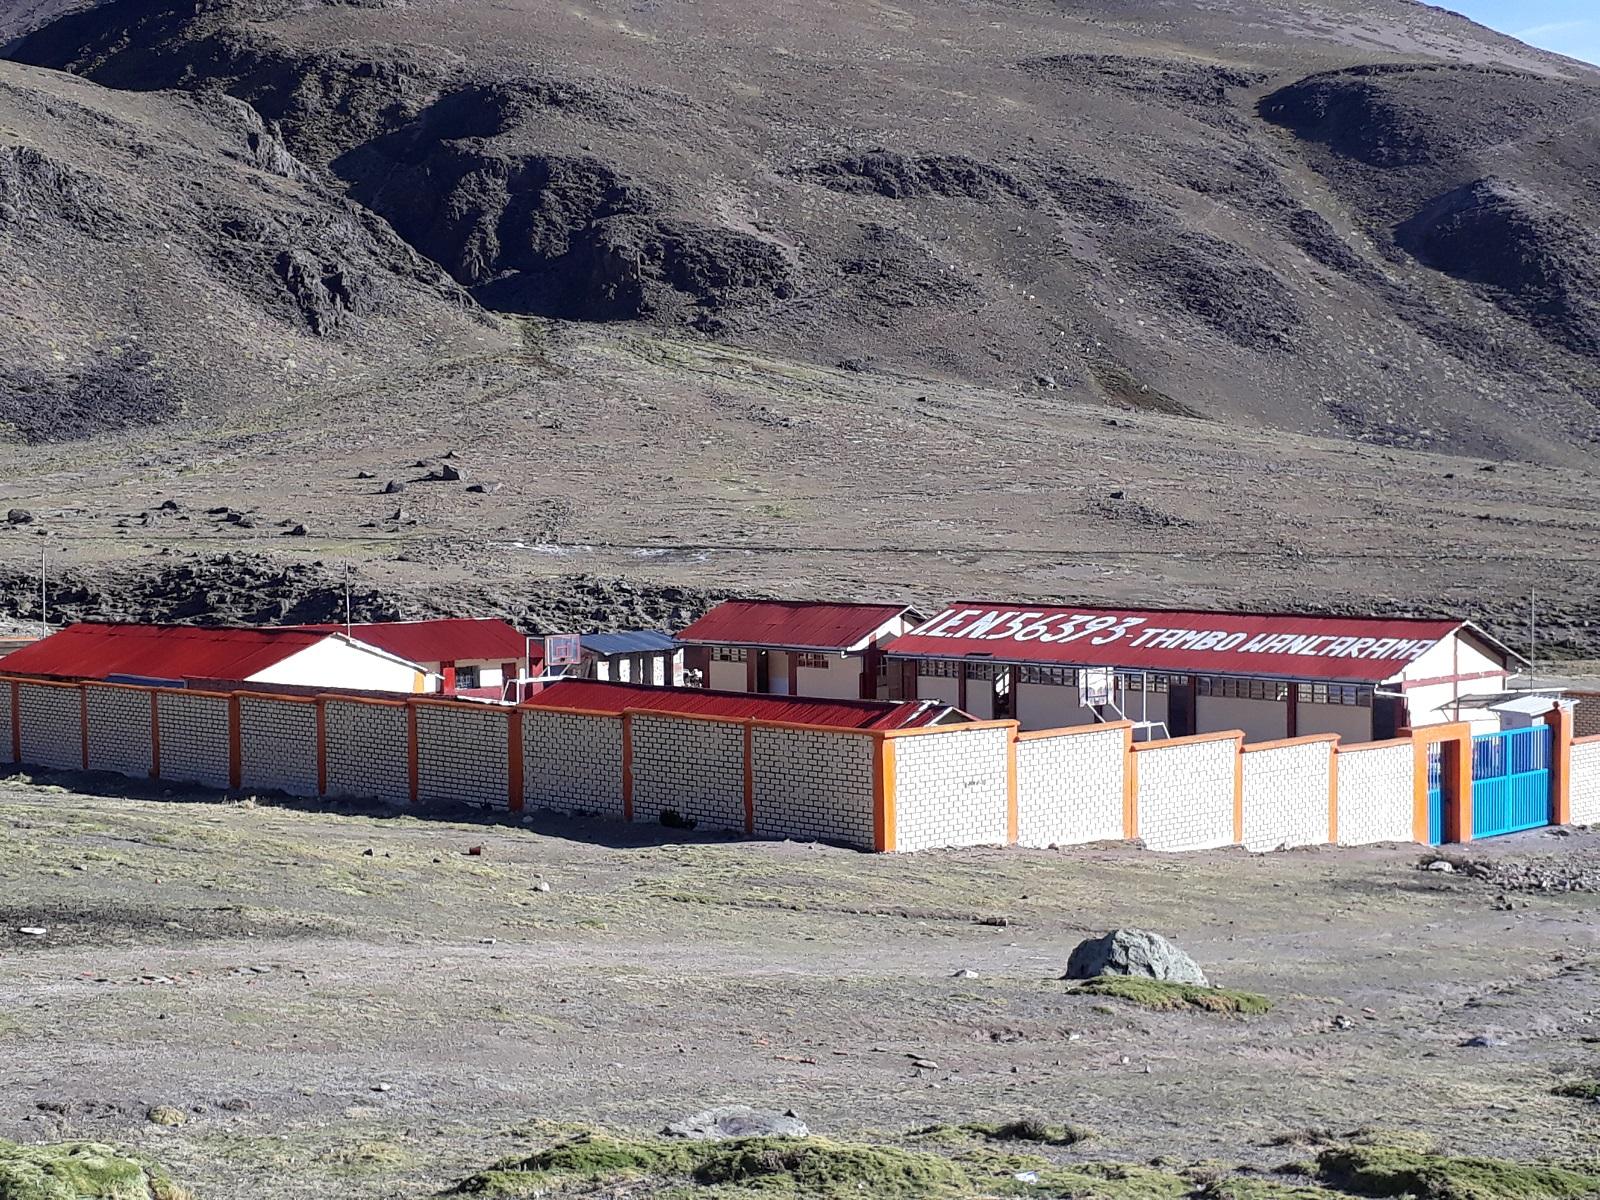 Escuela 56393 - Tambo Wancarama